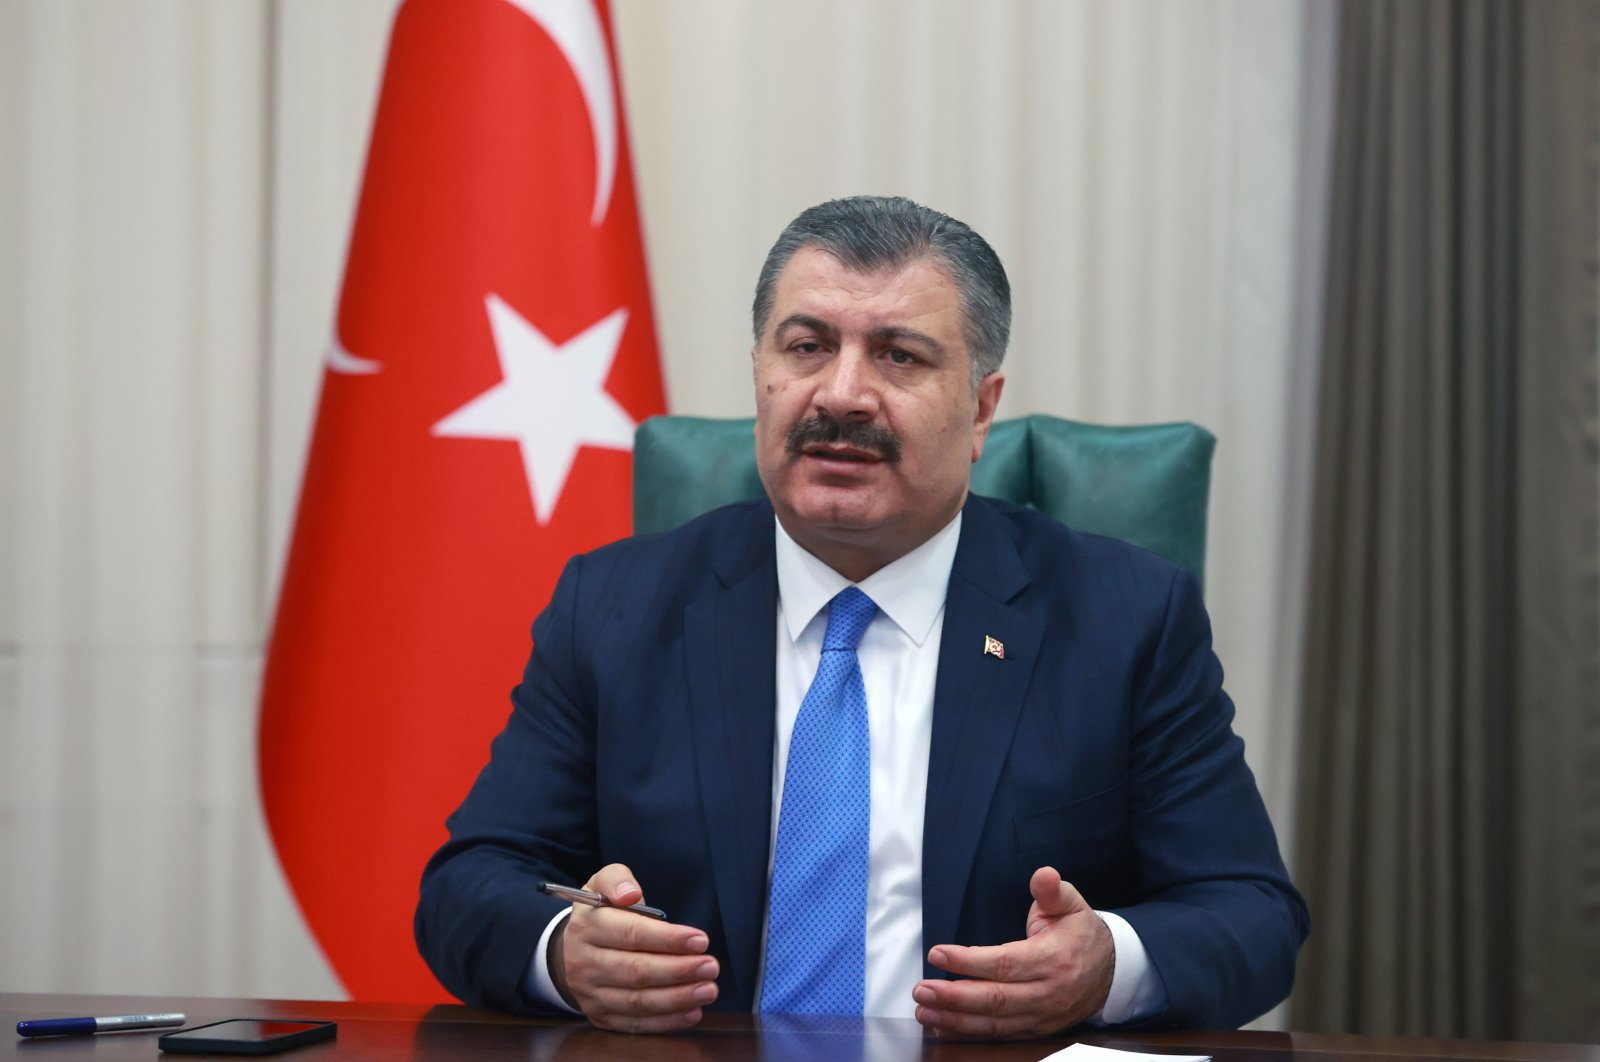 Health Minister Fahrettin Koca speaks during a videoconference in Ankara on Mar. 25, 2021 (AA Photo)